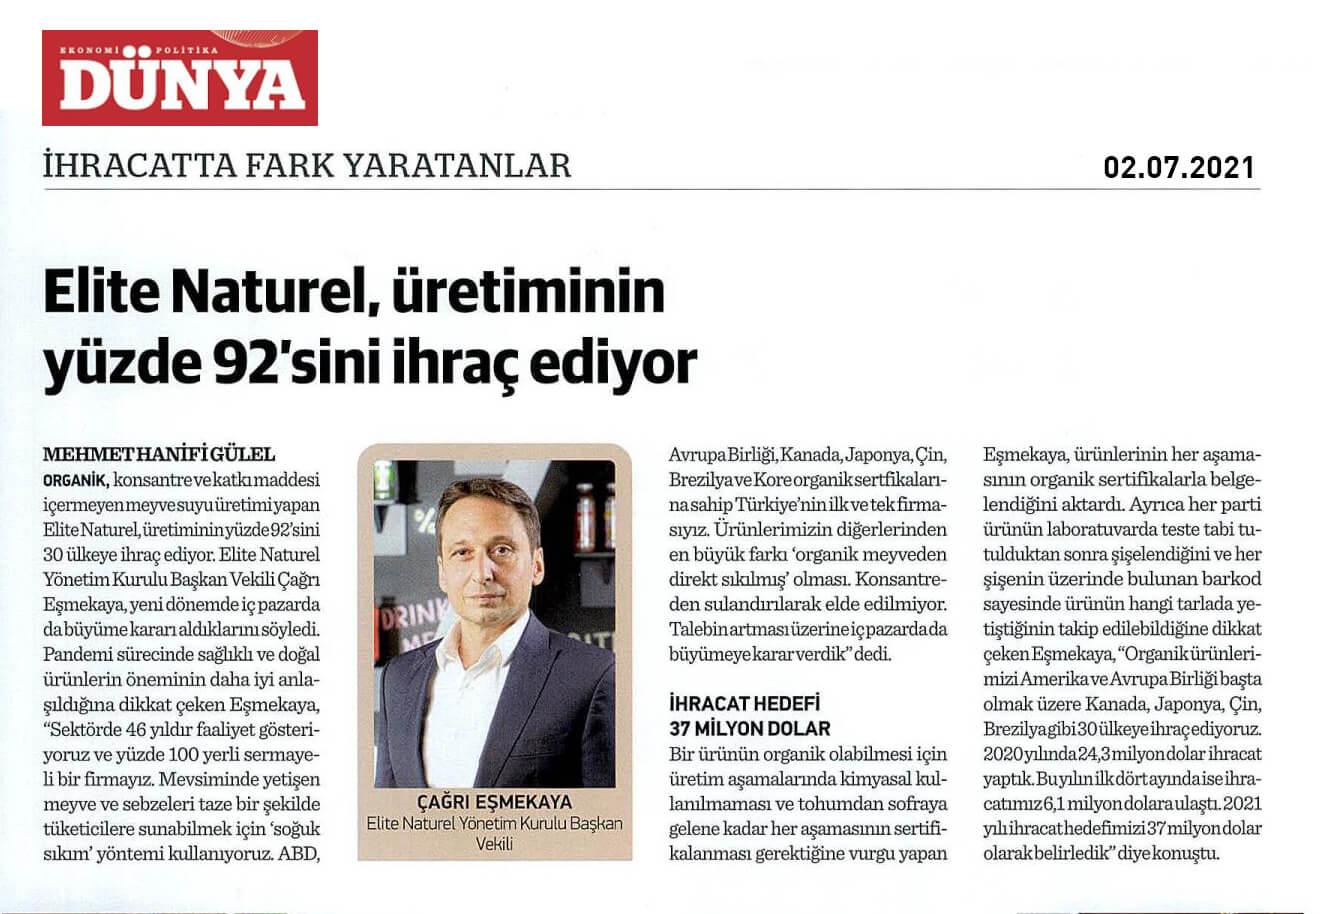 Dunya Gazetesi ihracat eki 02 07 2021 1 1